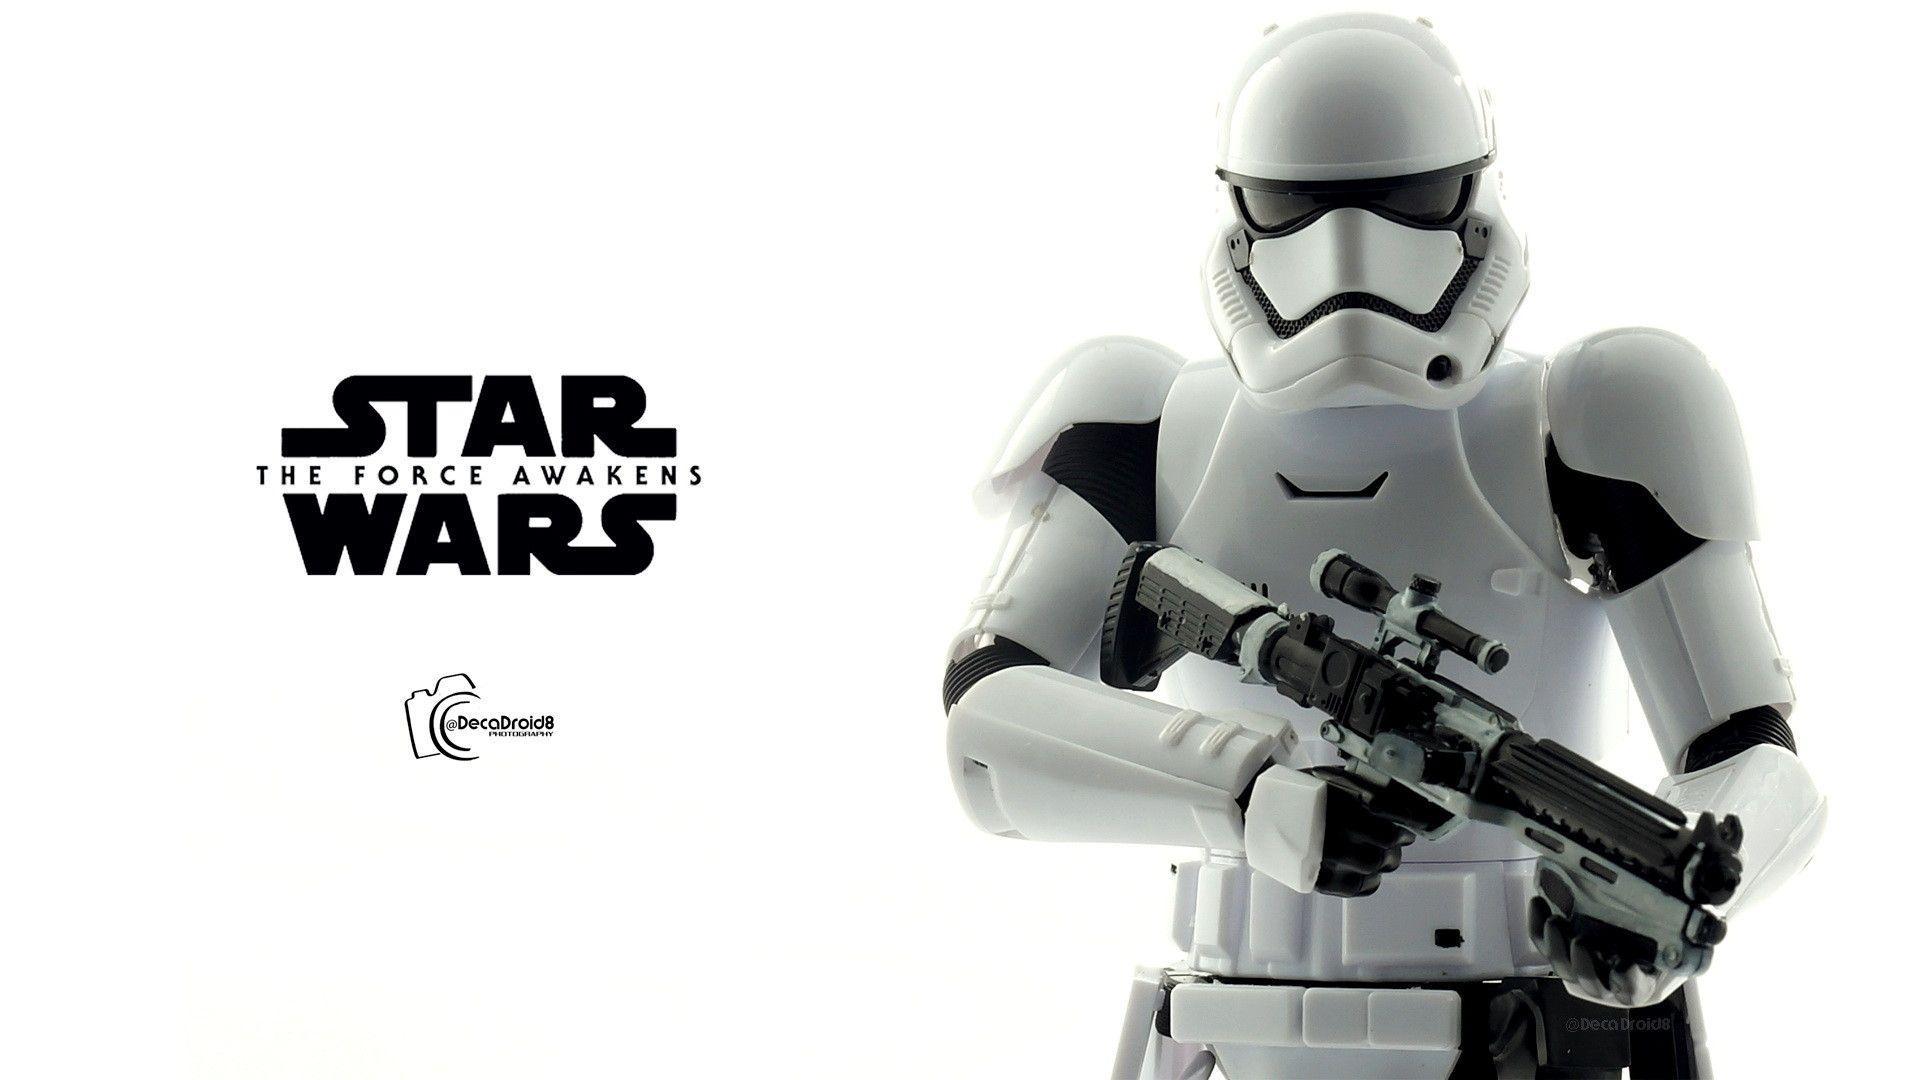 Star Wars Stormtrooper Wallpapers Top Free Star Wars Stormtrooper